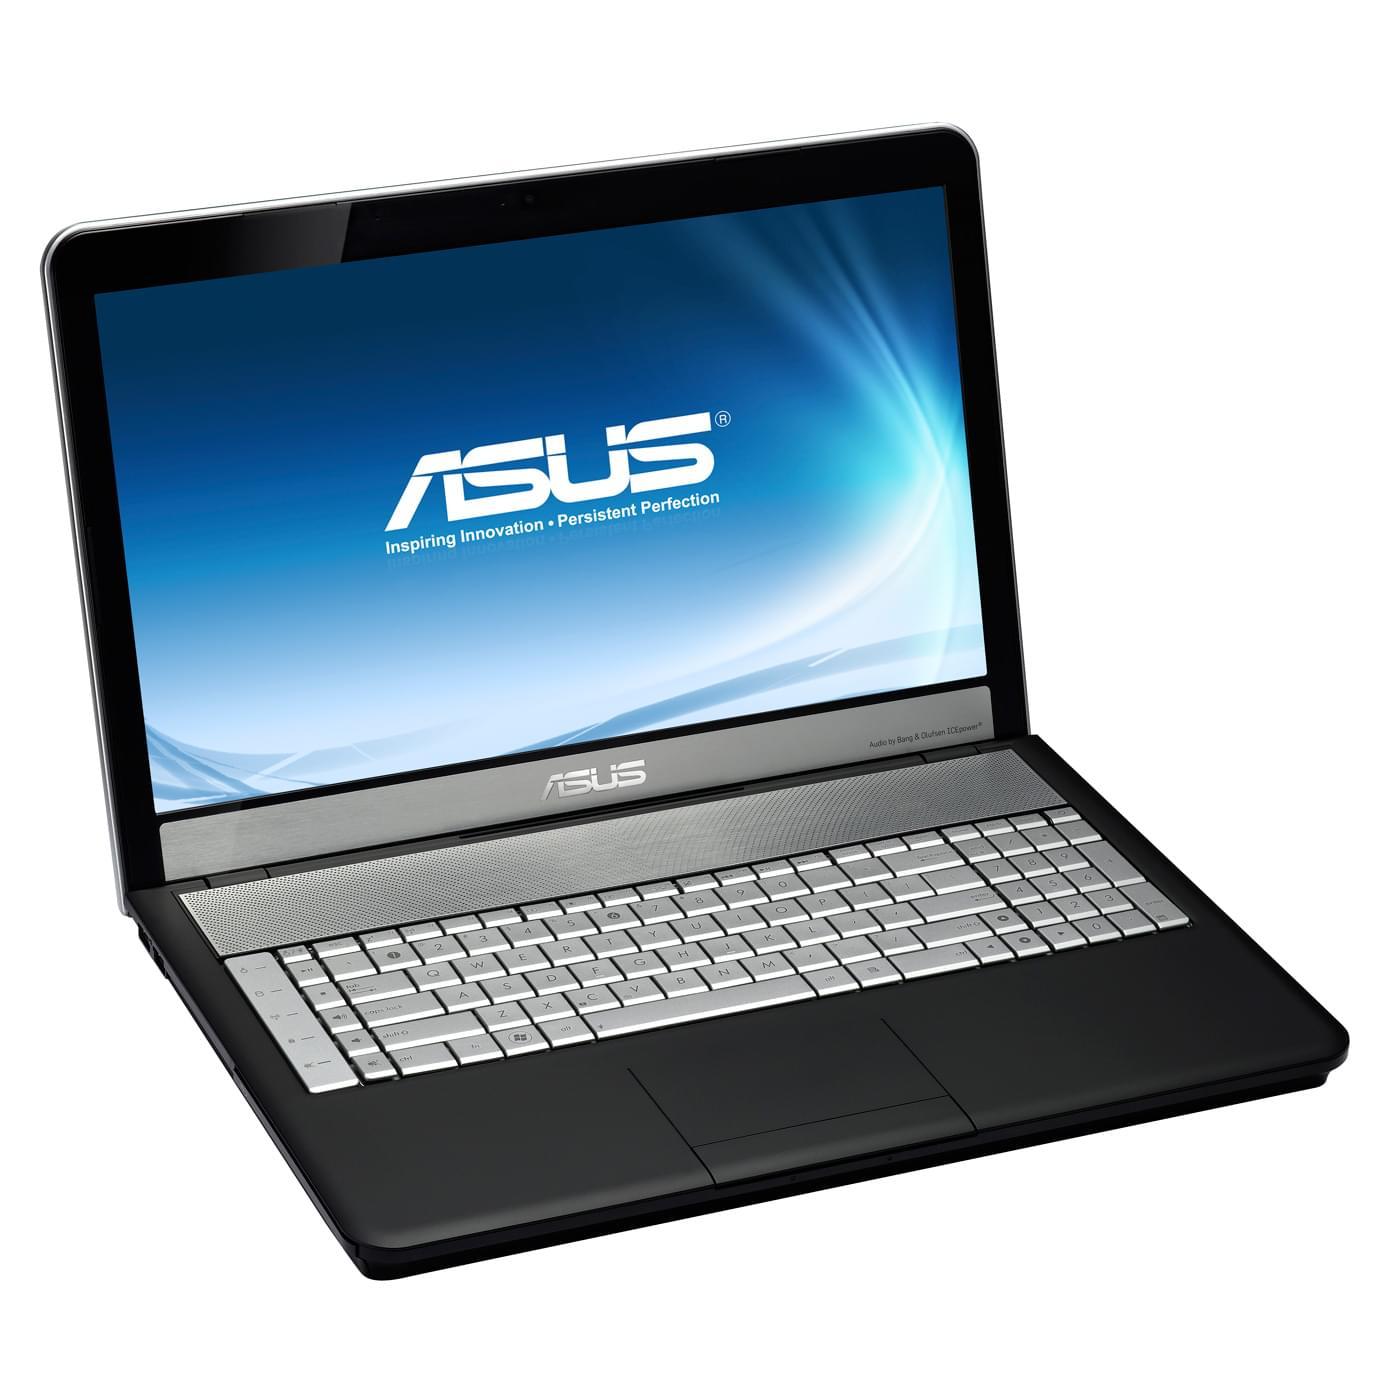 Asus N75SL-V2G-TZ090V (N75SL-V2G-TZ090V) - Achat / Vente PC Portable sur Cybertek.fr - 0